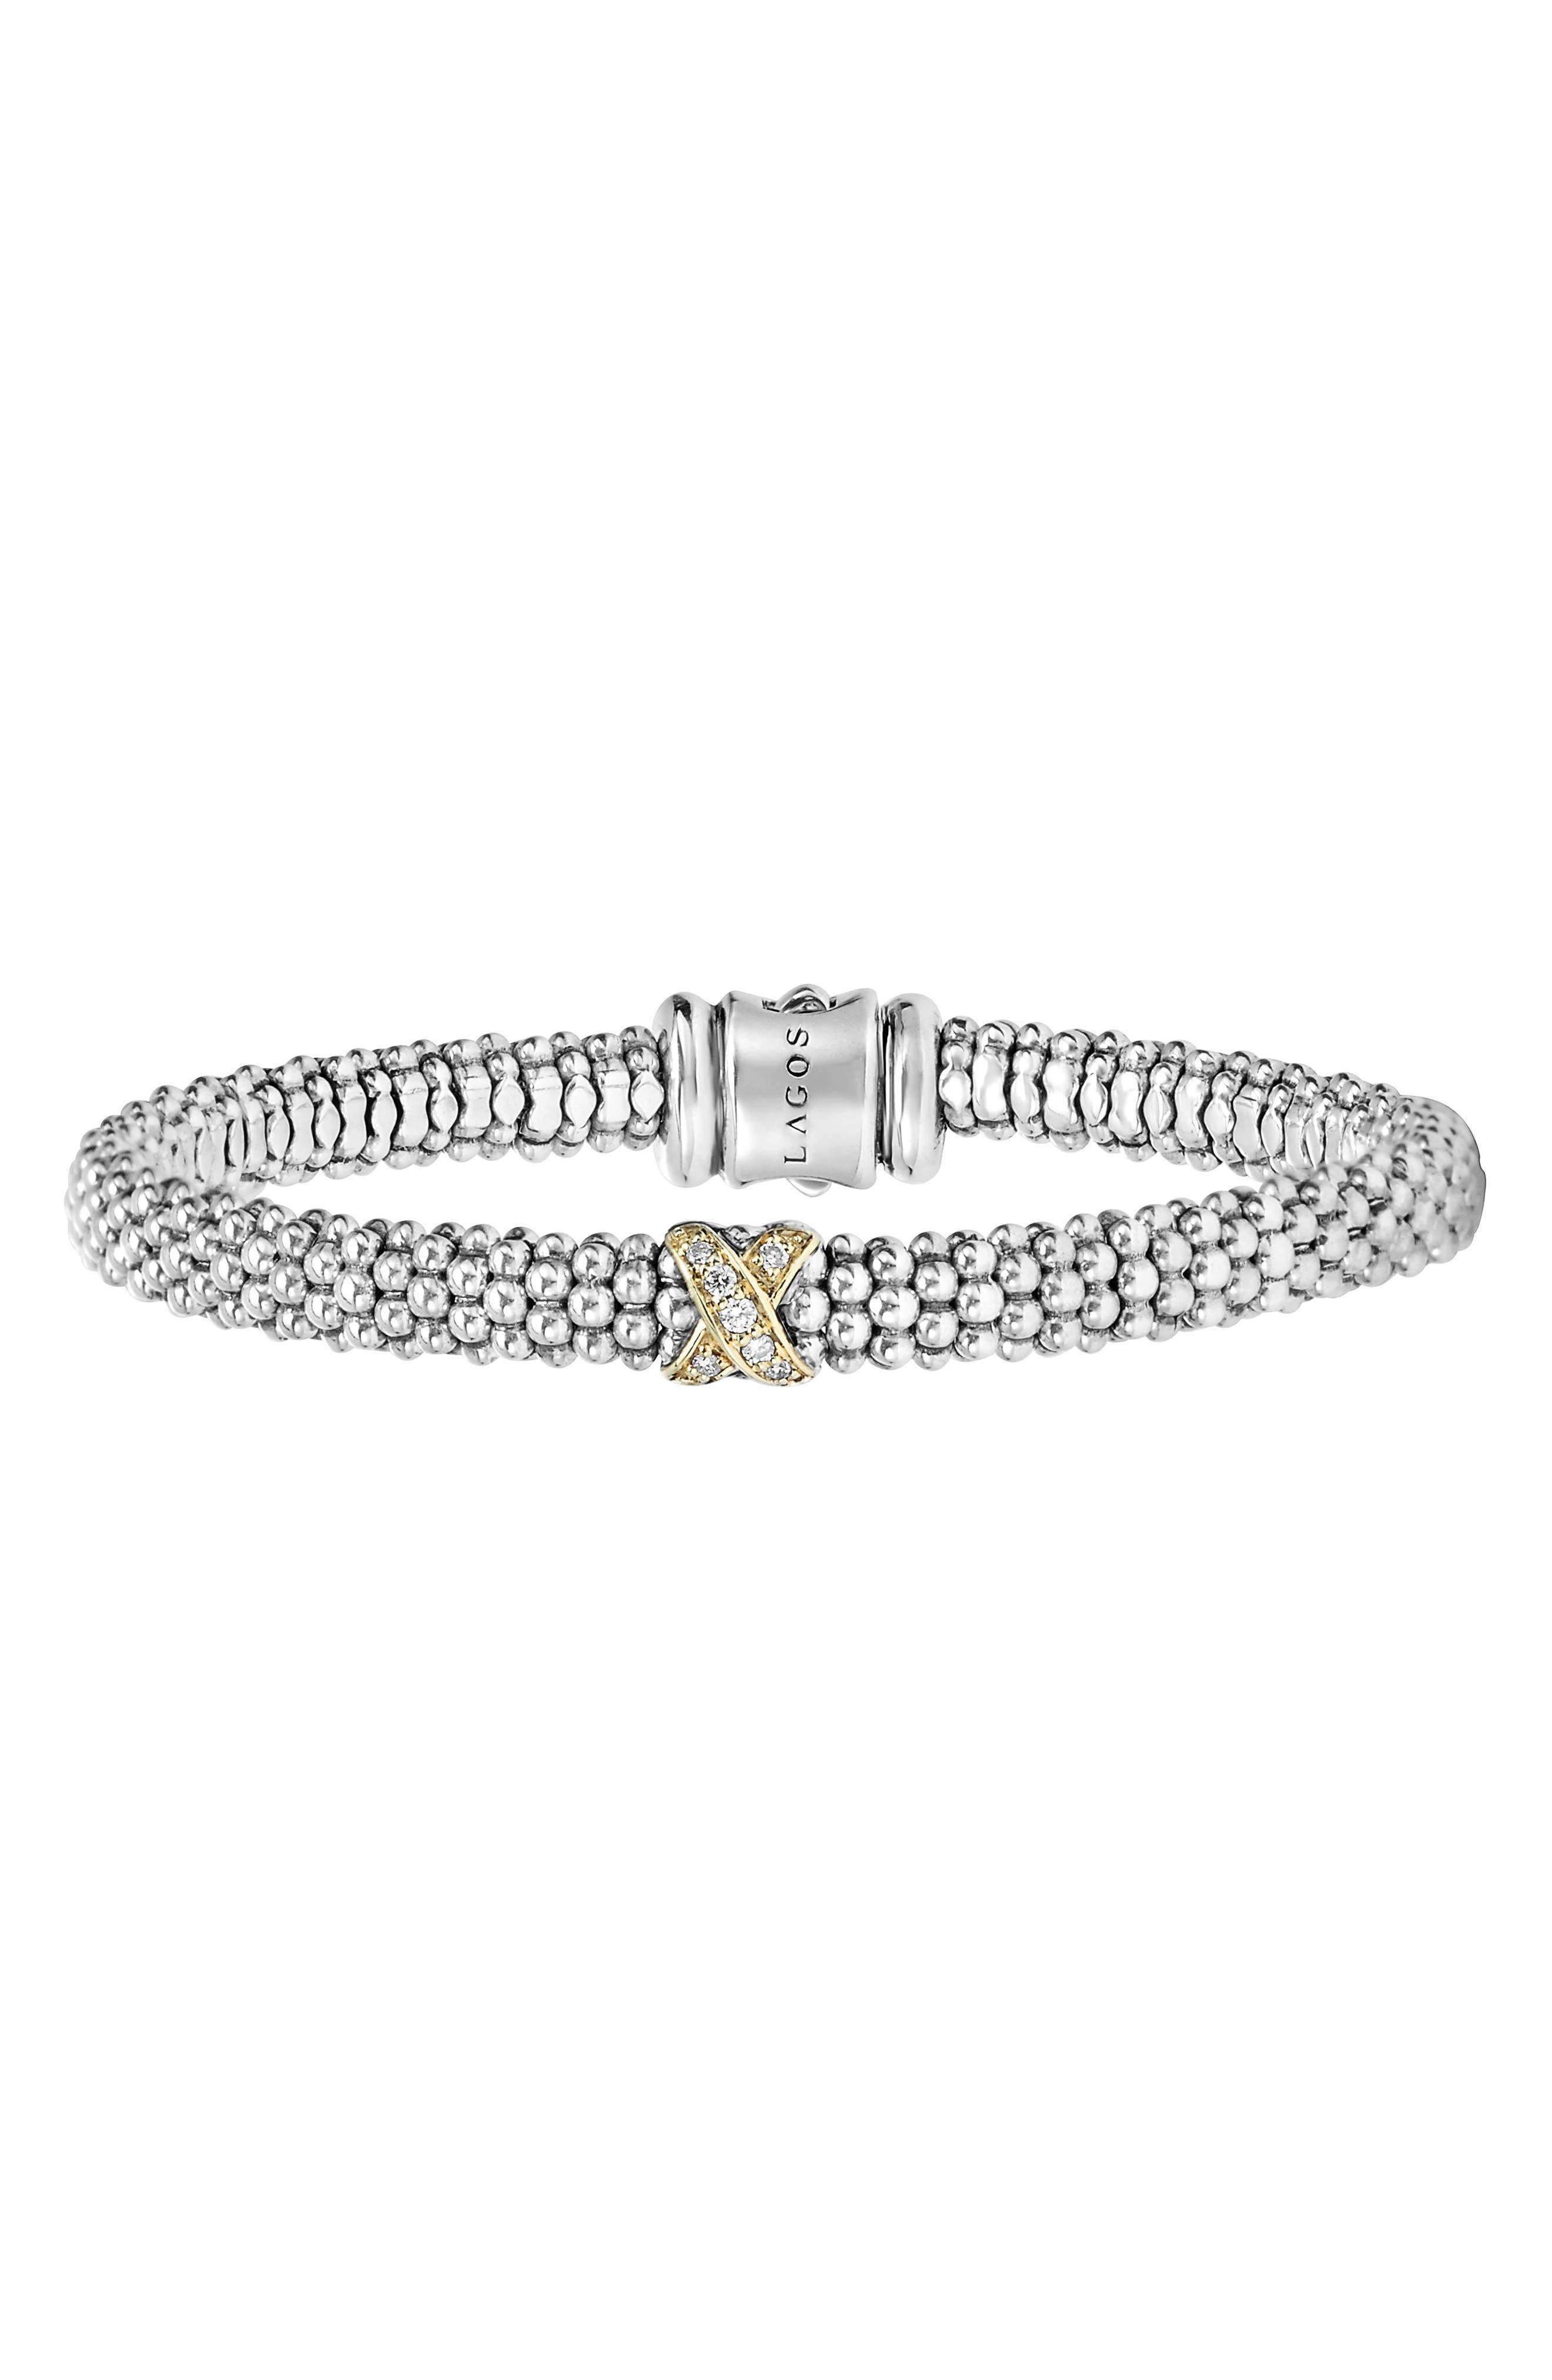 LAGOS, Caviar 'Signature Caviar' Diamond Rope Bracelet, Alternate thumbnail 7, color, STERLING SILVER/ GOLD